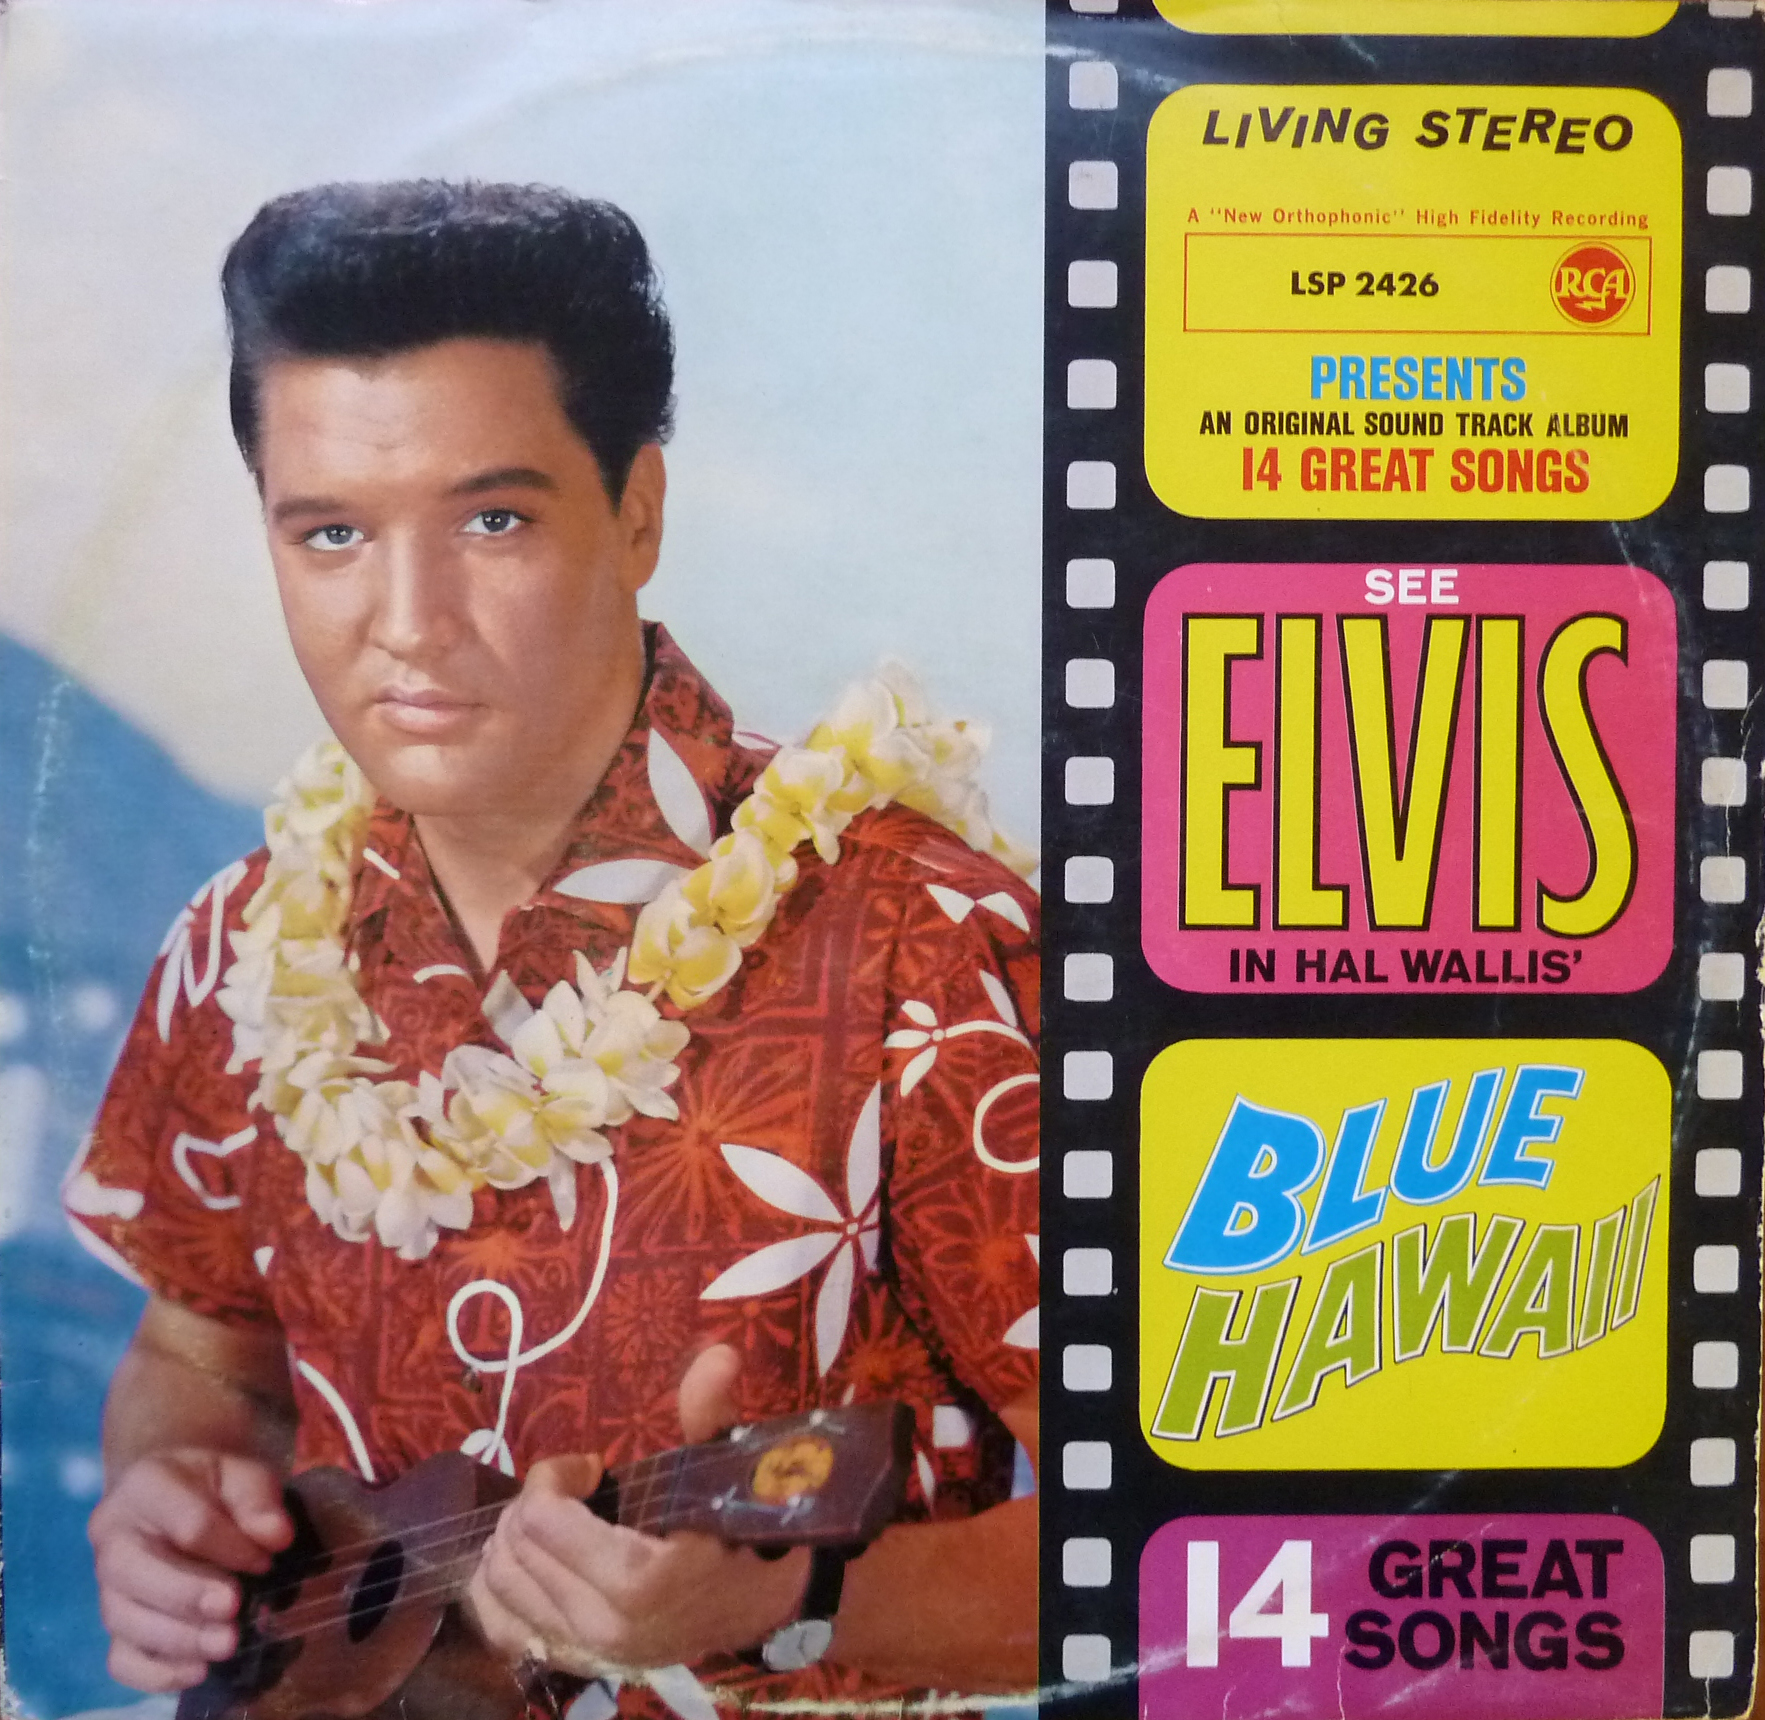 BLUE HAWAII Bluehawaii_1965_lsp_ffrki8